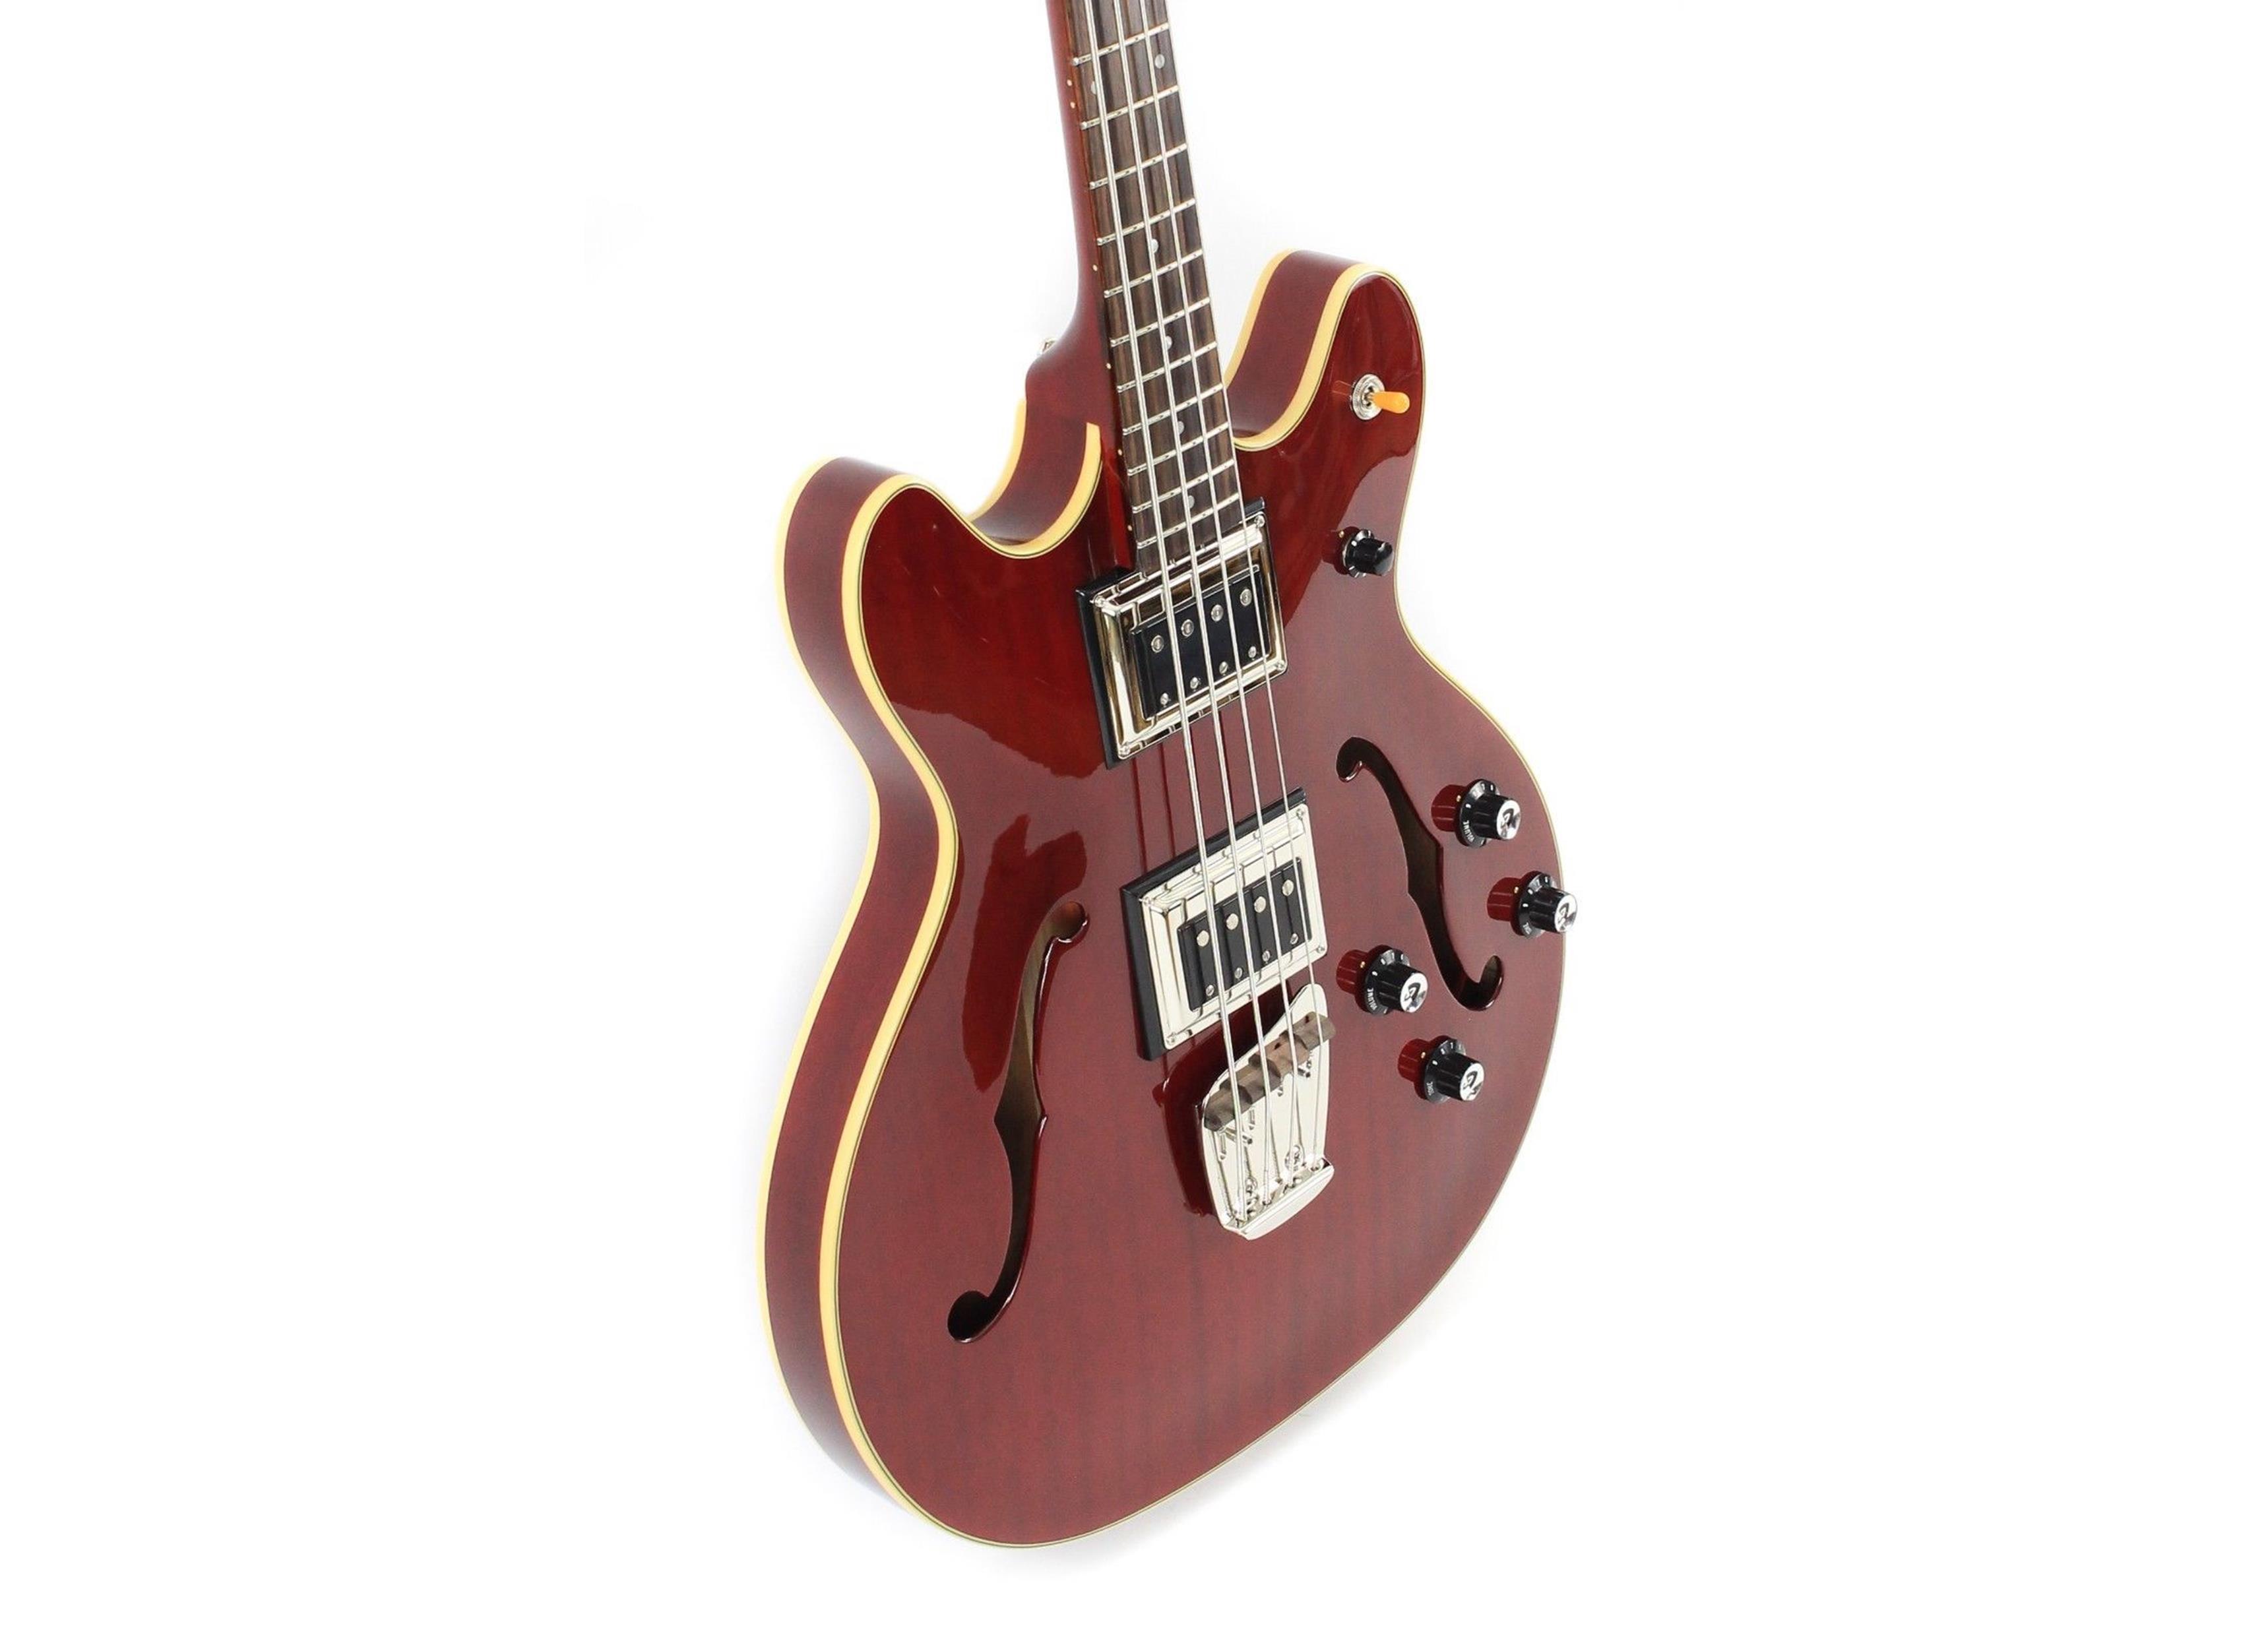 GUILD Starfire Bass II Cherry hardshell case - 3792410866